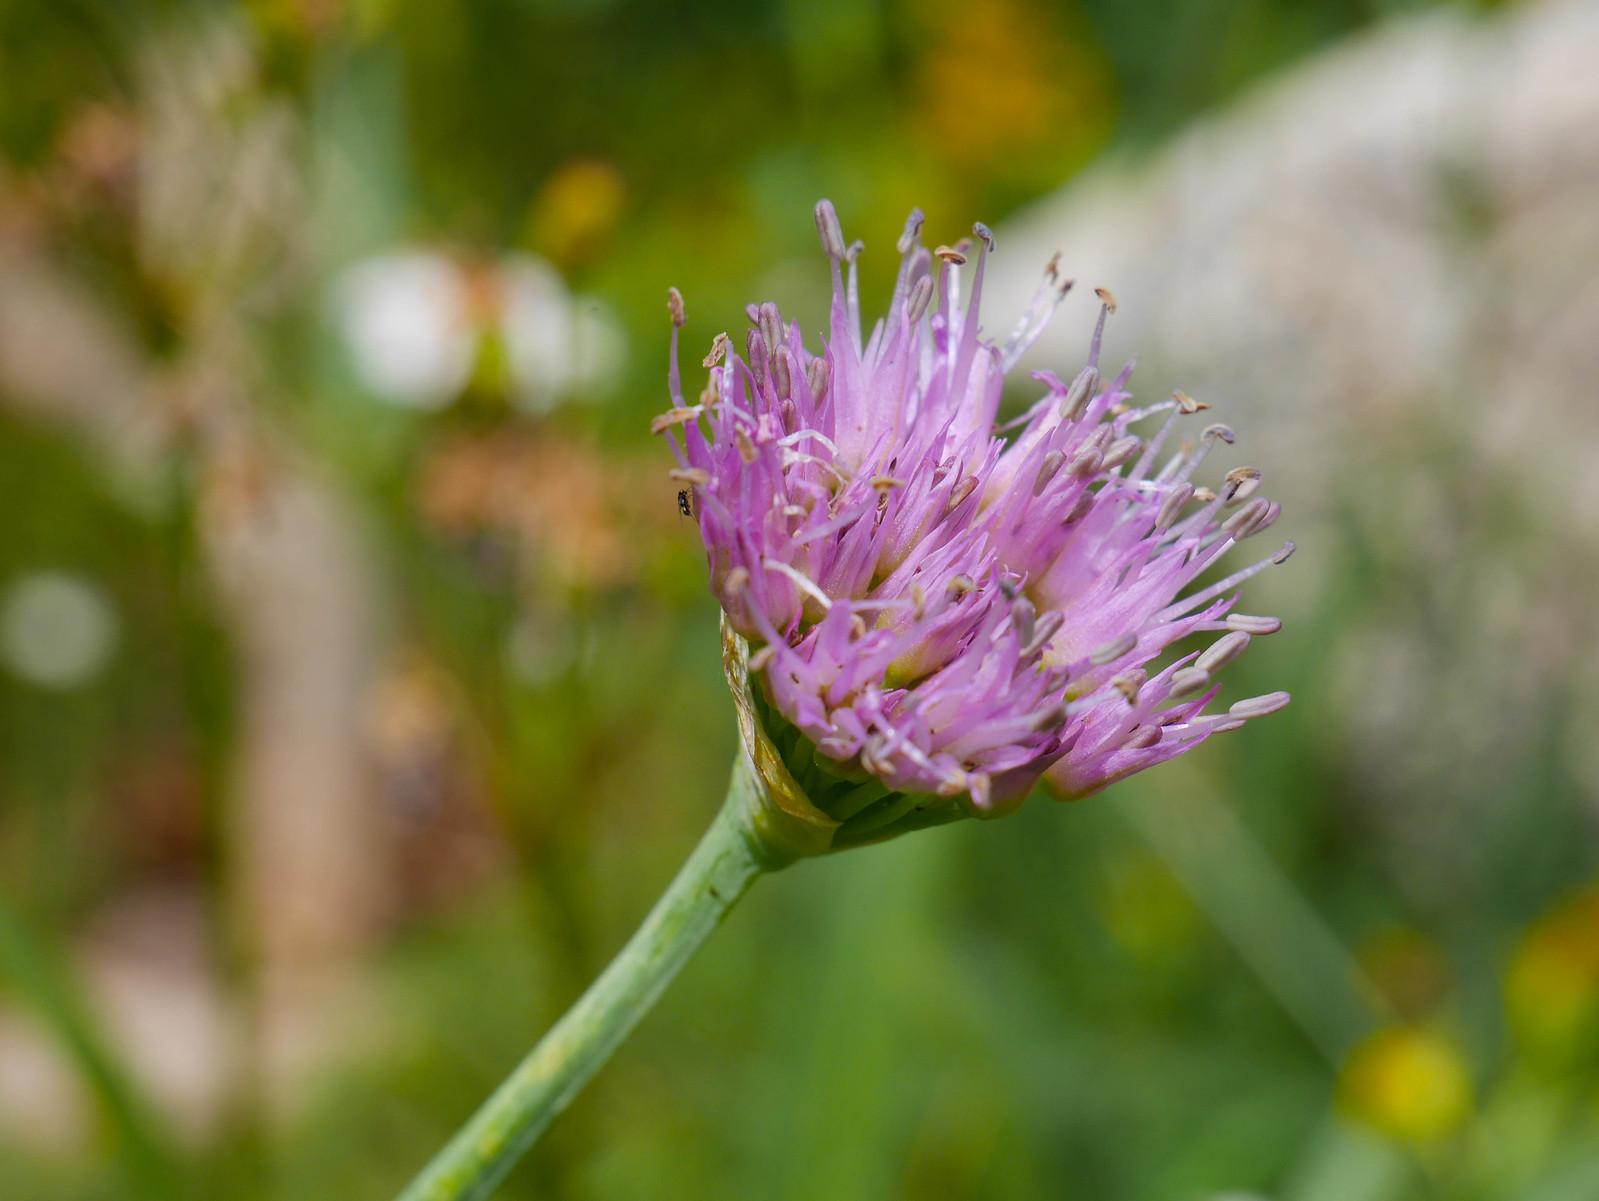 Wild onion